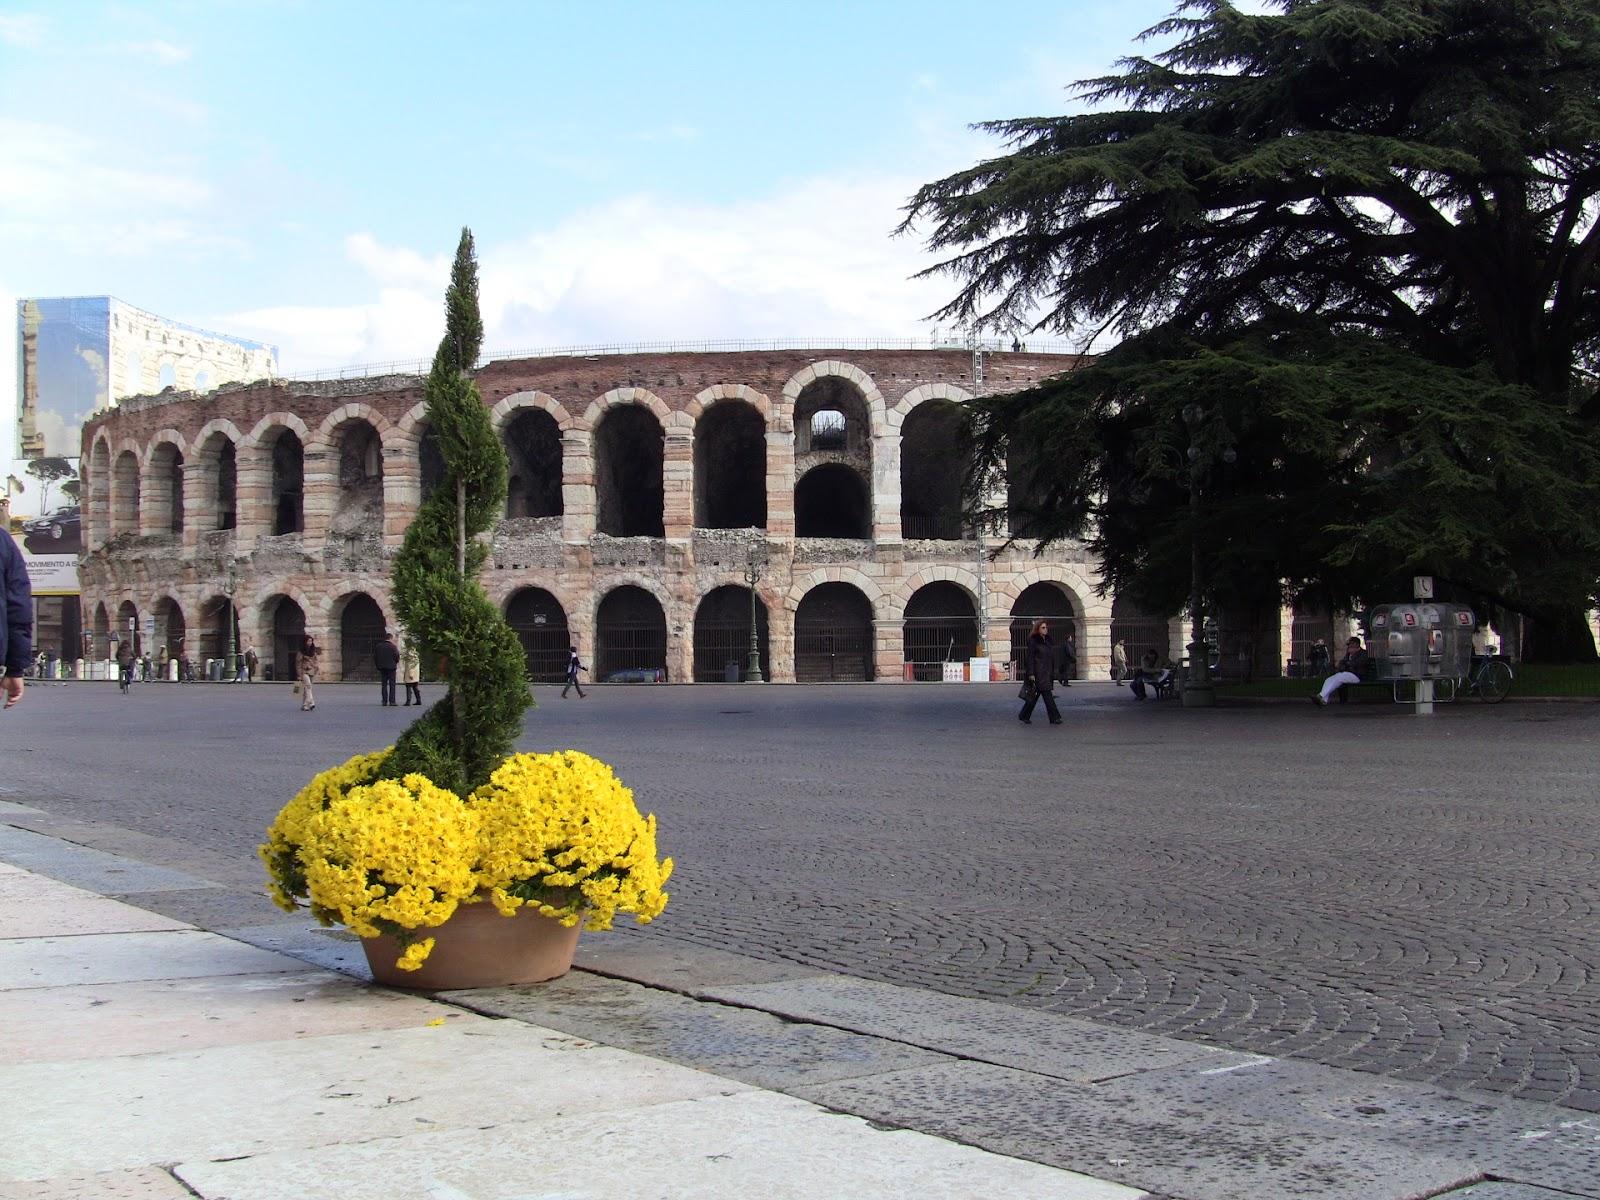 The Arena and Piazza Brà in Verona, Italy. Photo: Gail Keller, WineTrekkerTV.com.